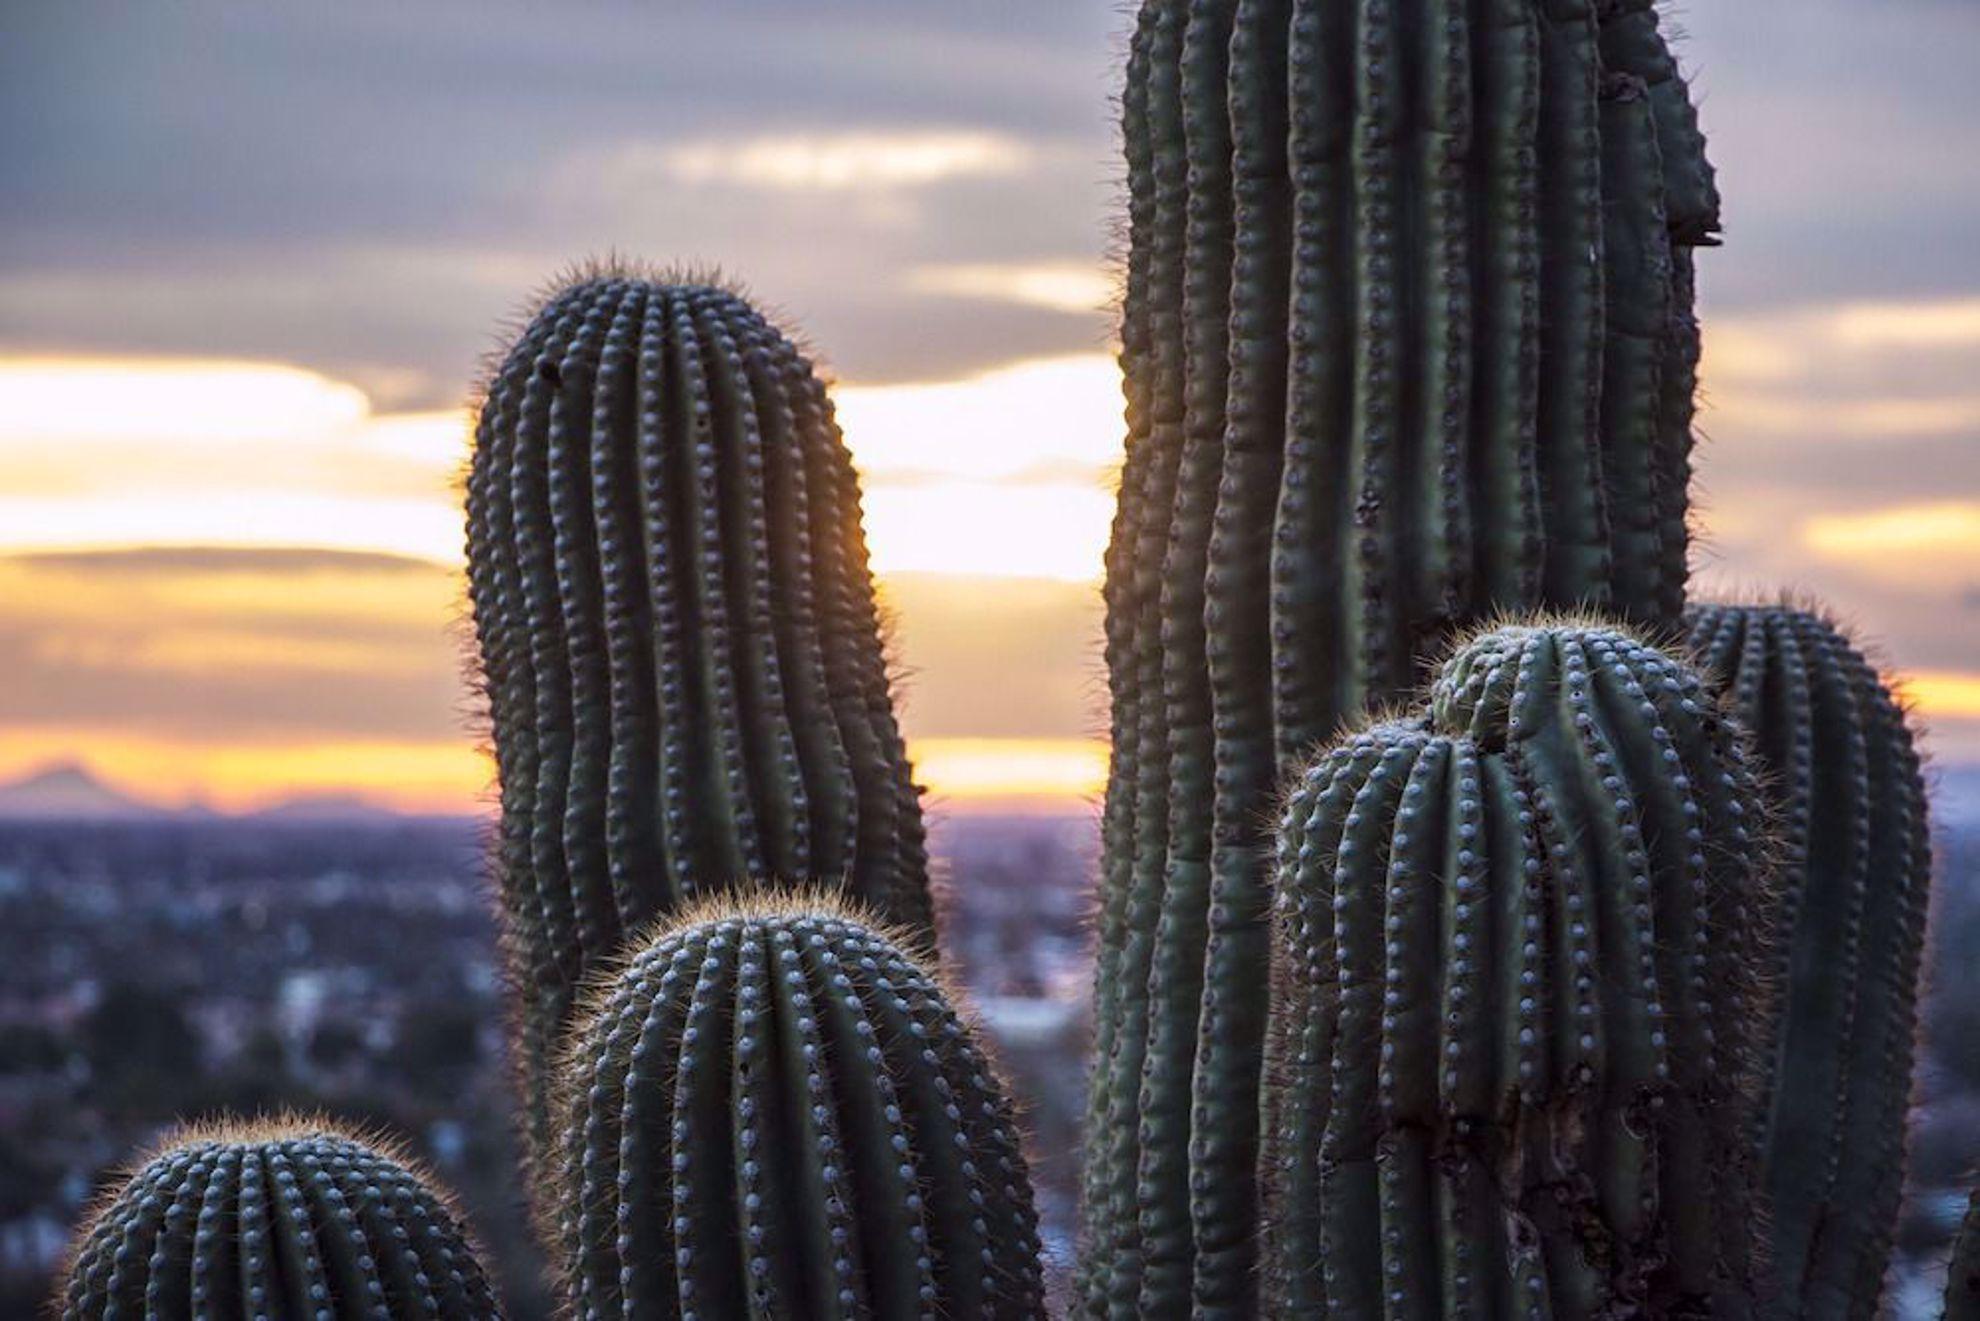 Cacti near Tucson